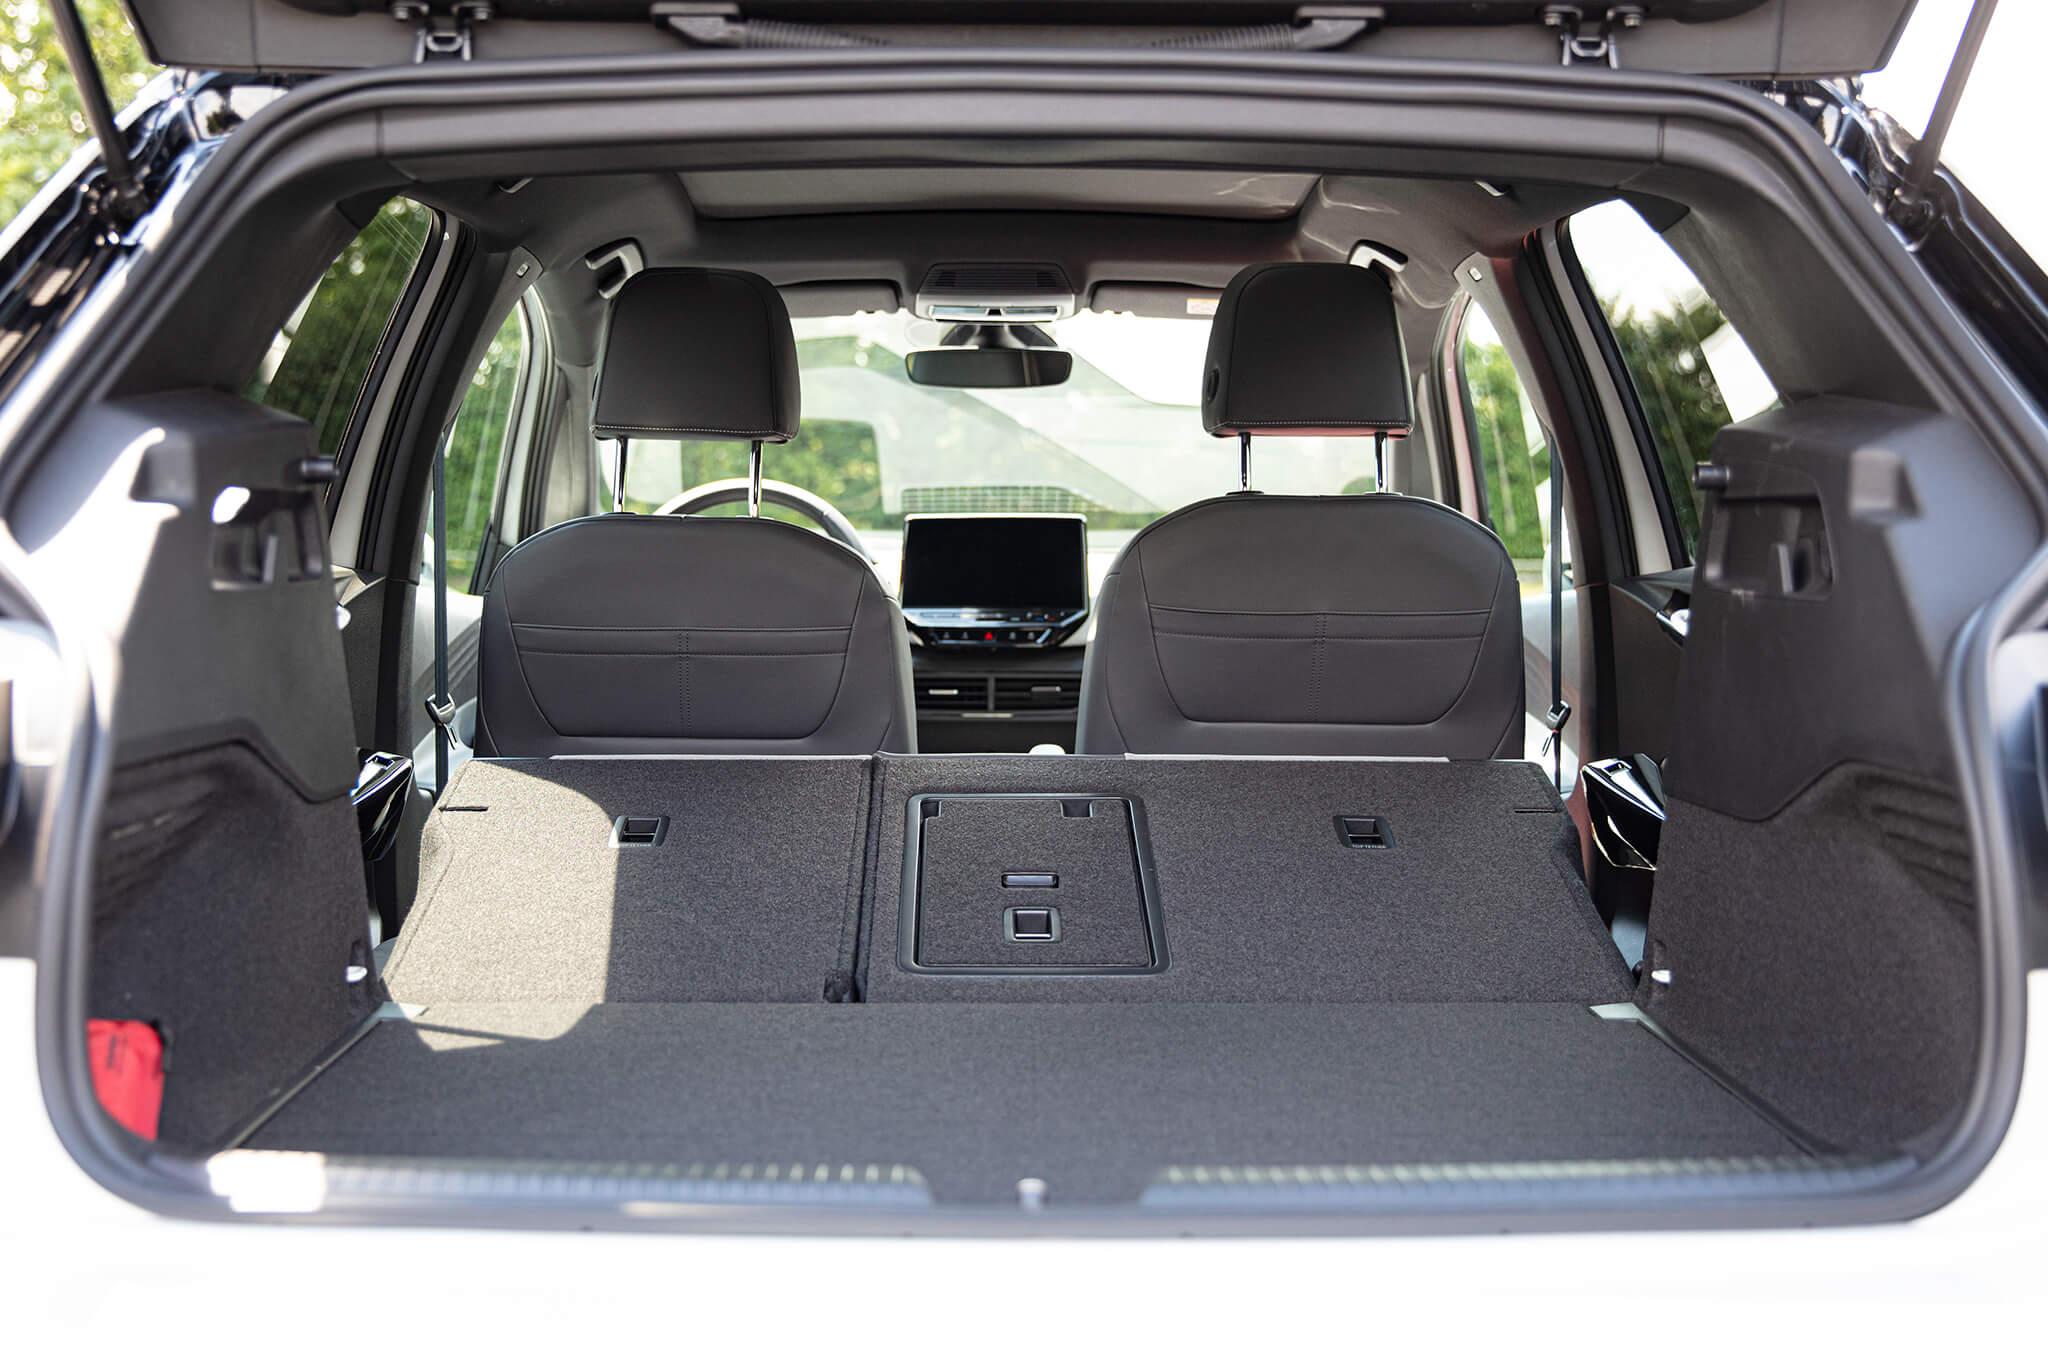 Capacidade de mala do Volkswagen ID.3